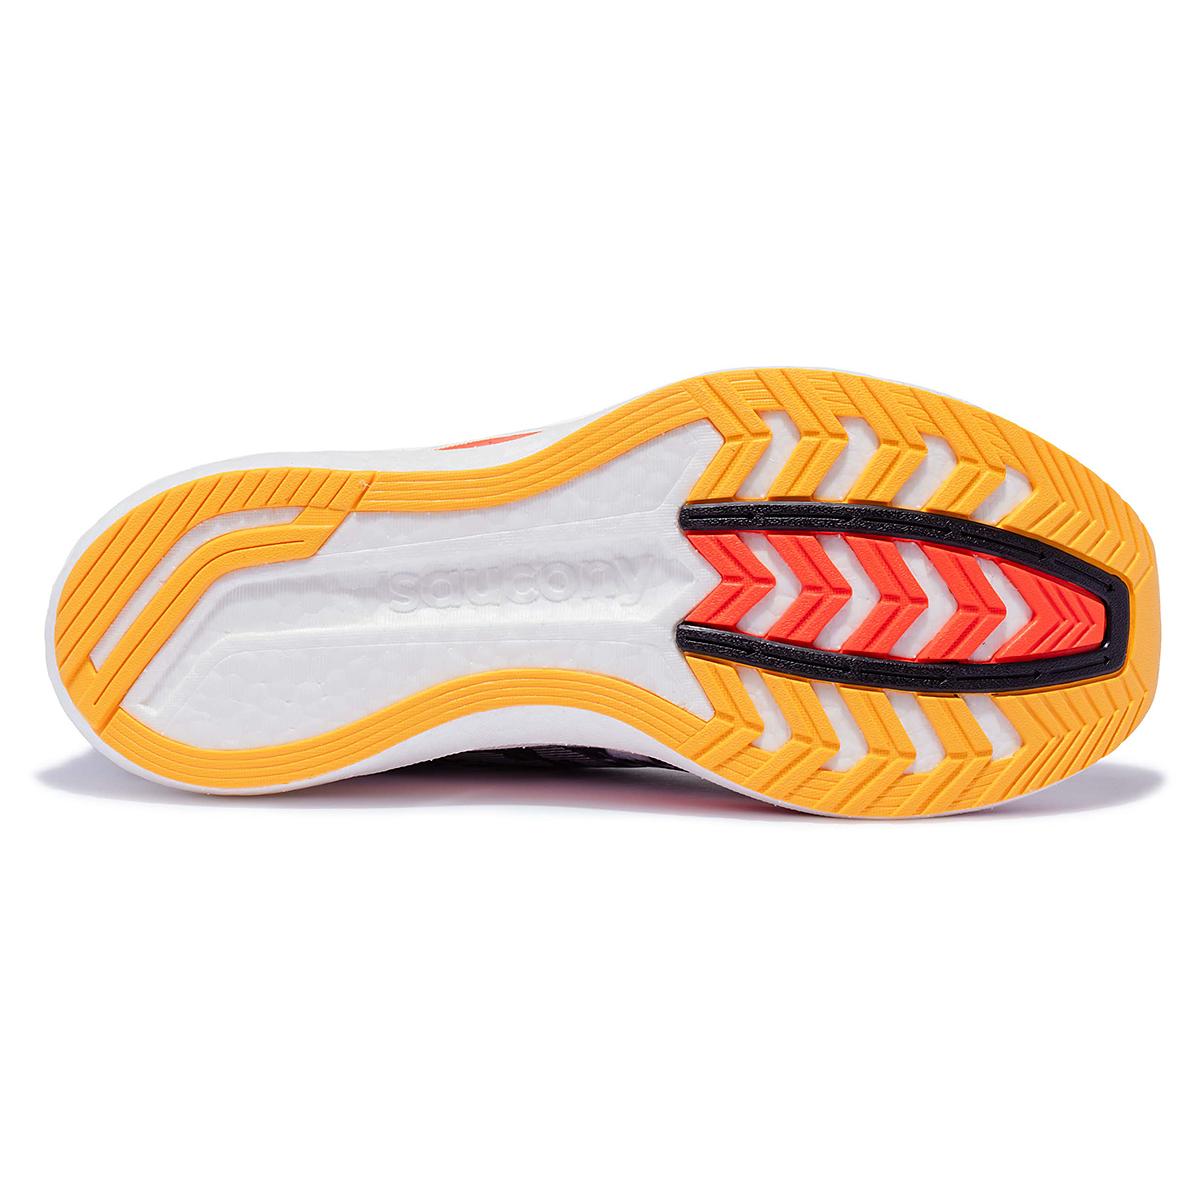 Women's Saucony Endorphin Speed 2 Running Shoe - Color: Reverie - Size: 5 - Width: Regular, Reverie, large, image 4